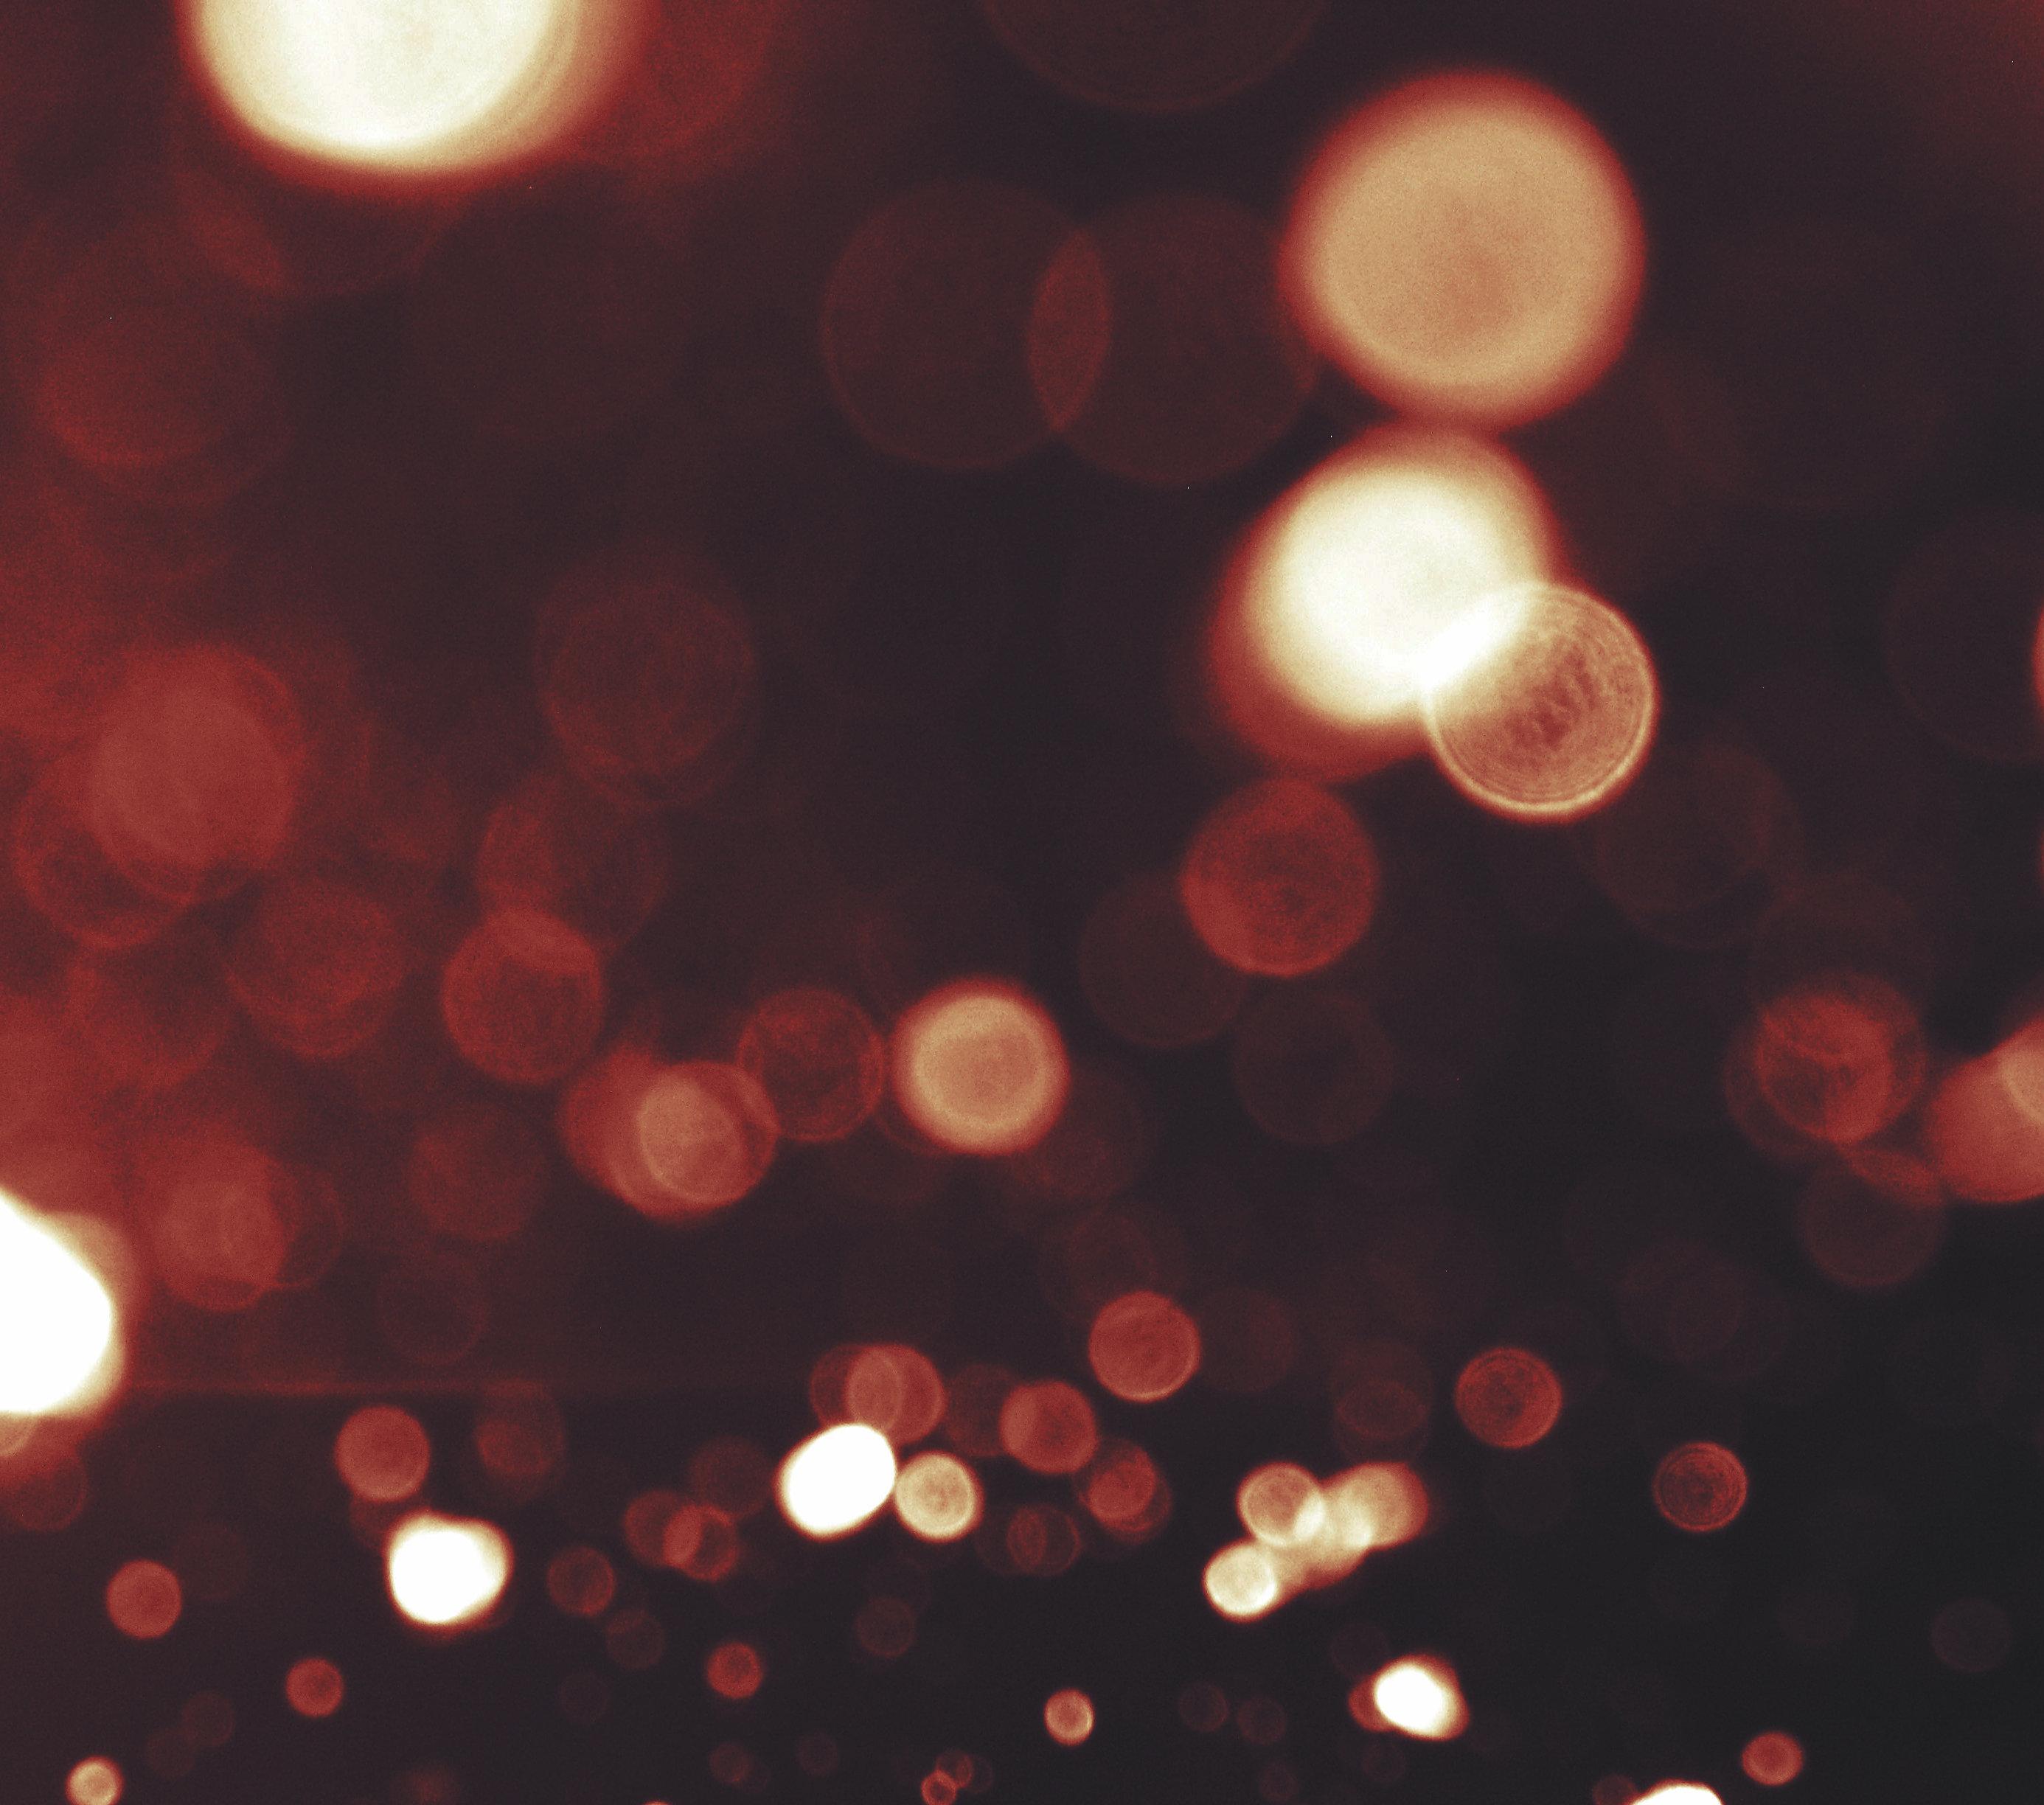 Free photo: Red Bokeh Texture - Bokeh, Effect, Light - Free Download - Jooinn